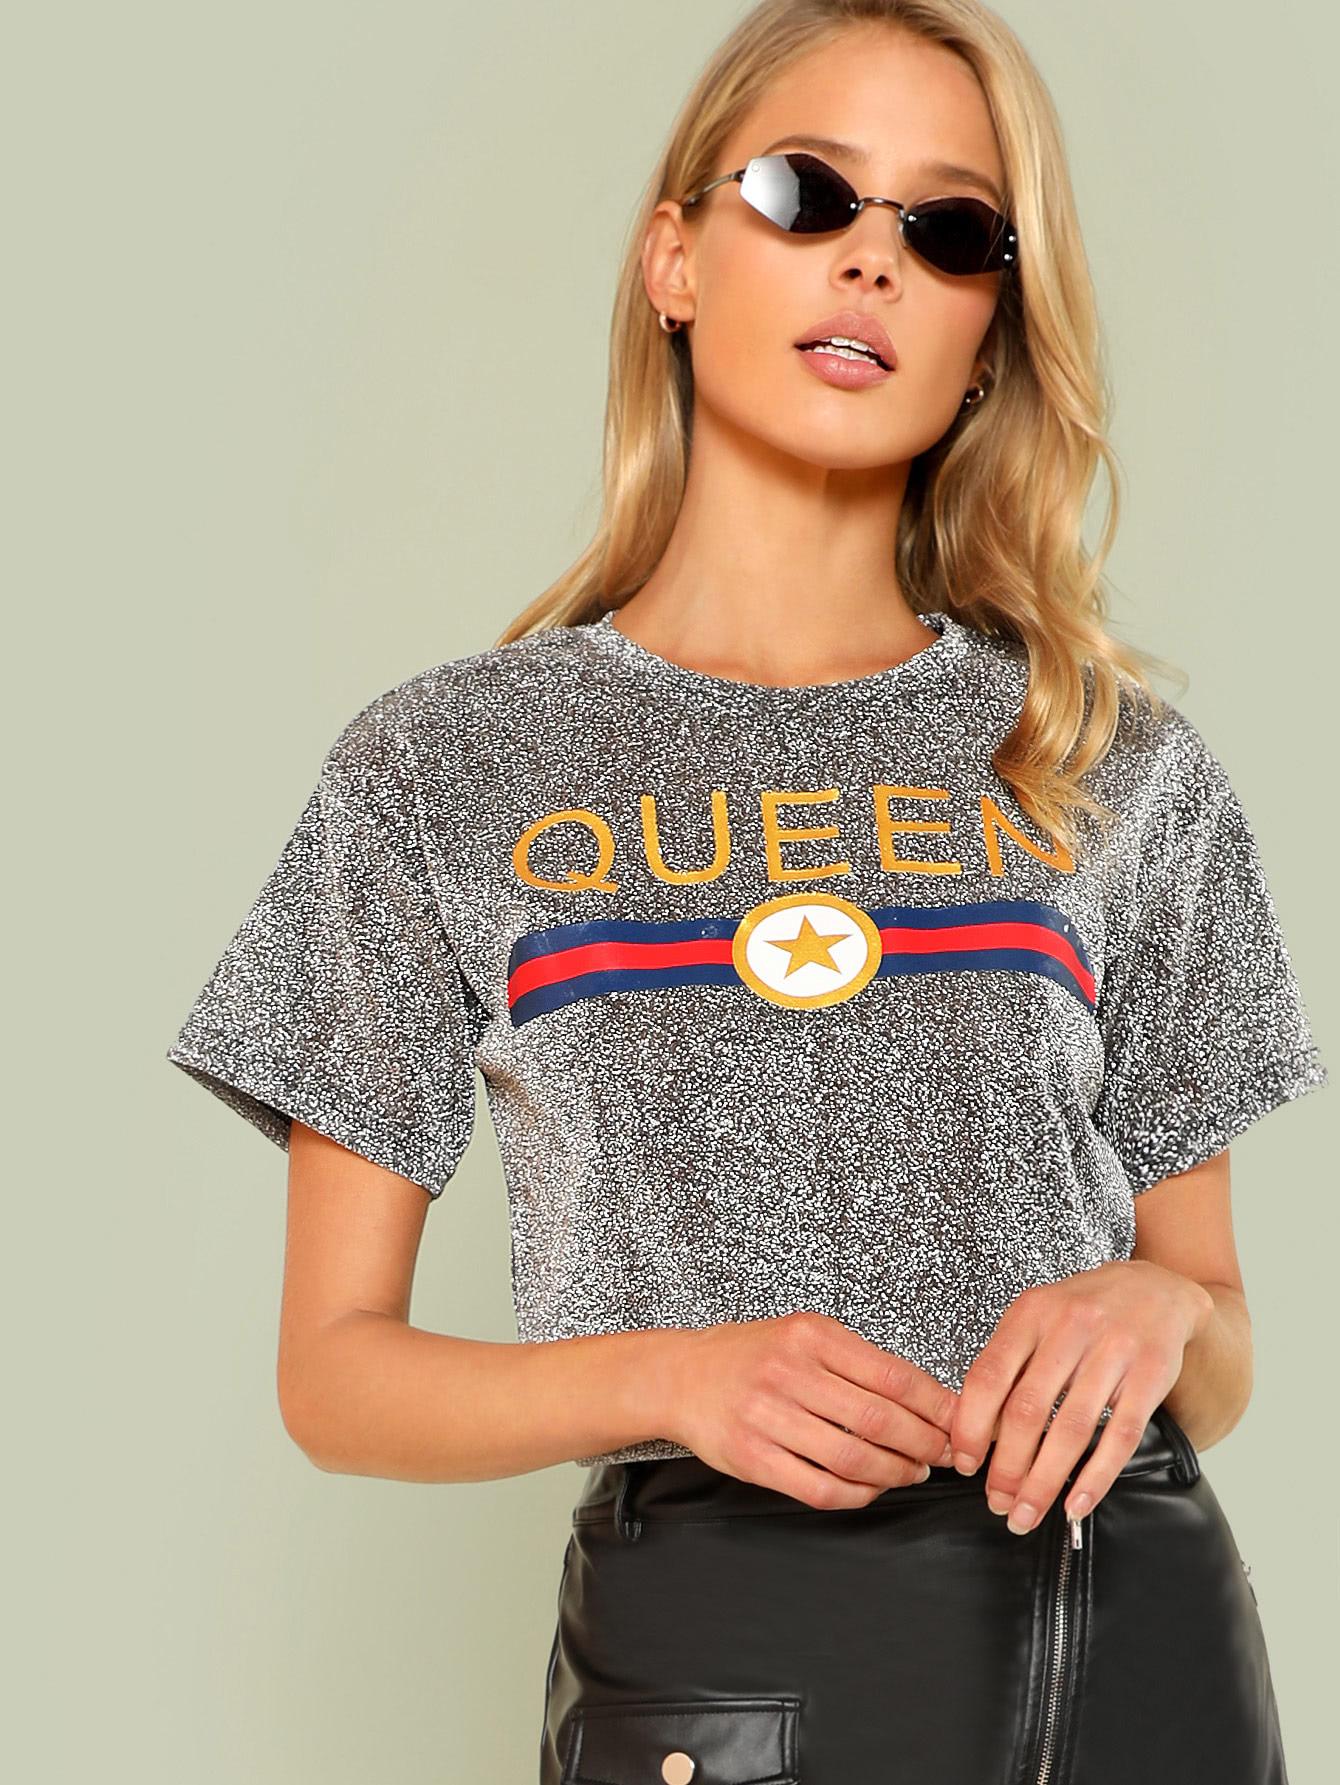 Купить Модная футболка с принтом, Allie Leggett, SheIn